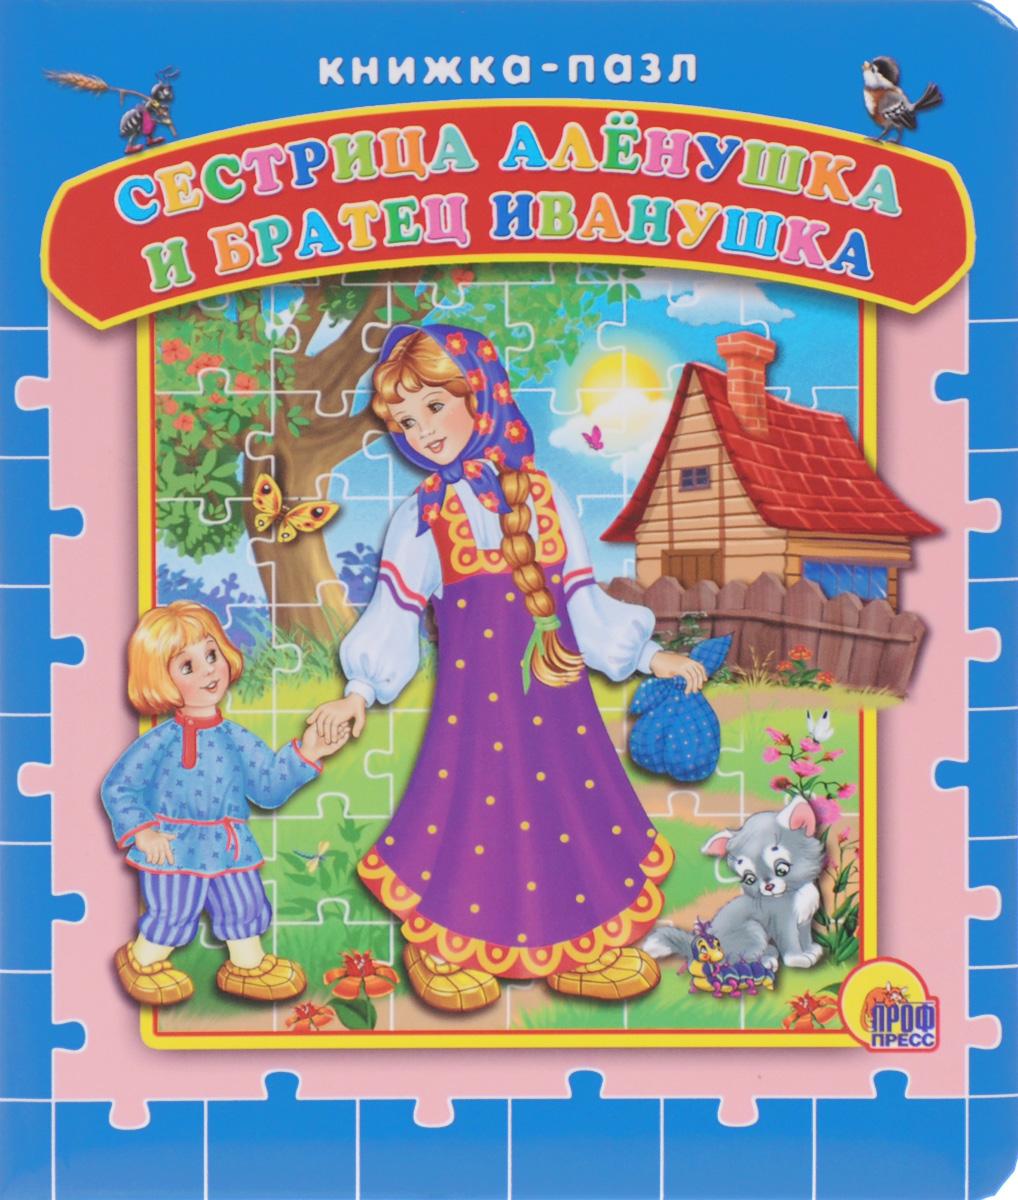 Сестрица Алёнушка и братец Иванушка. Книжка-пазл говорящие книжки азбукварик книжка цыплёнок